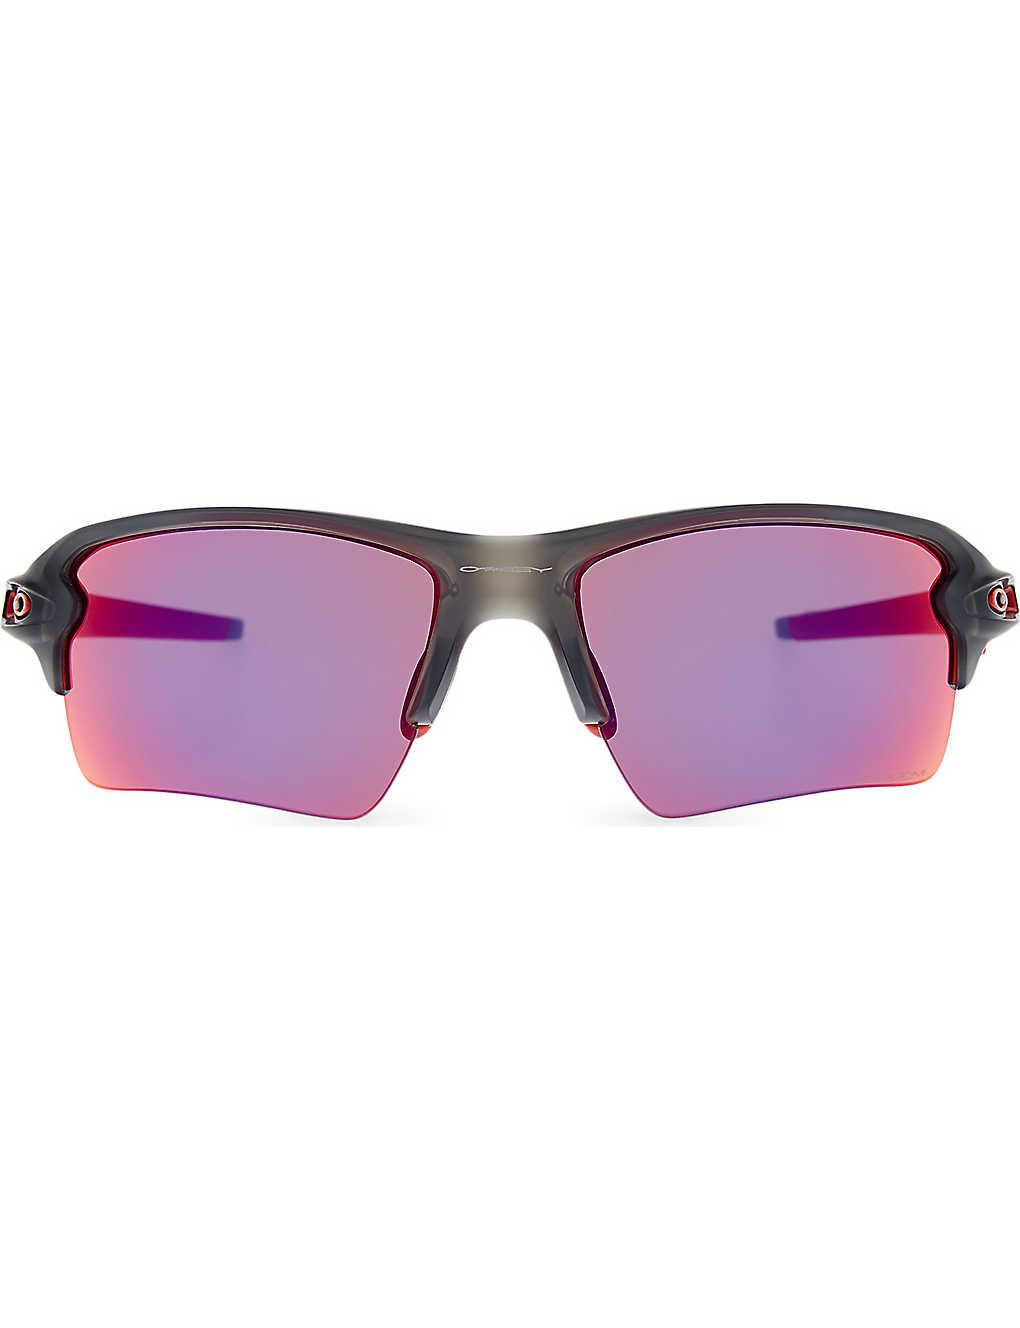 cceca6937c OAKLEY - Flak 2.0 XL PRIZM Road wrap-around sunglasses